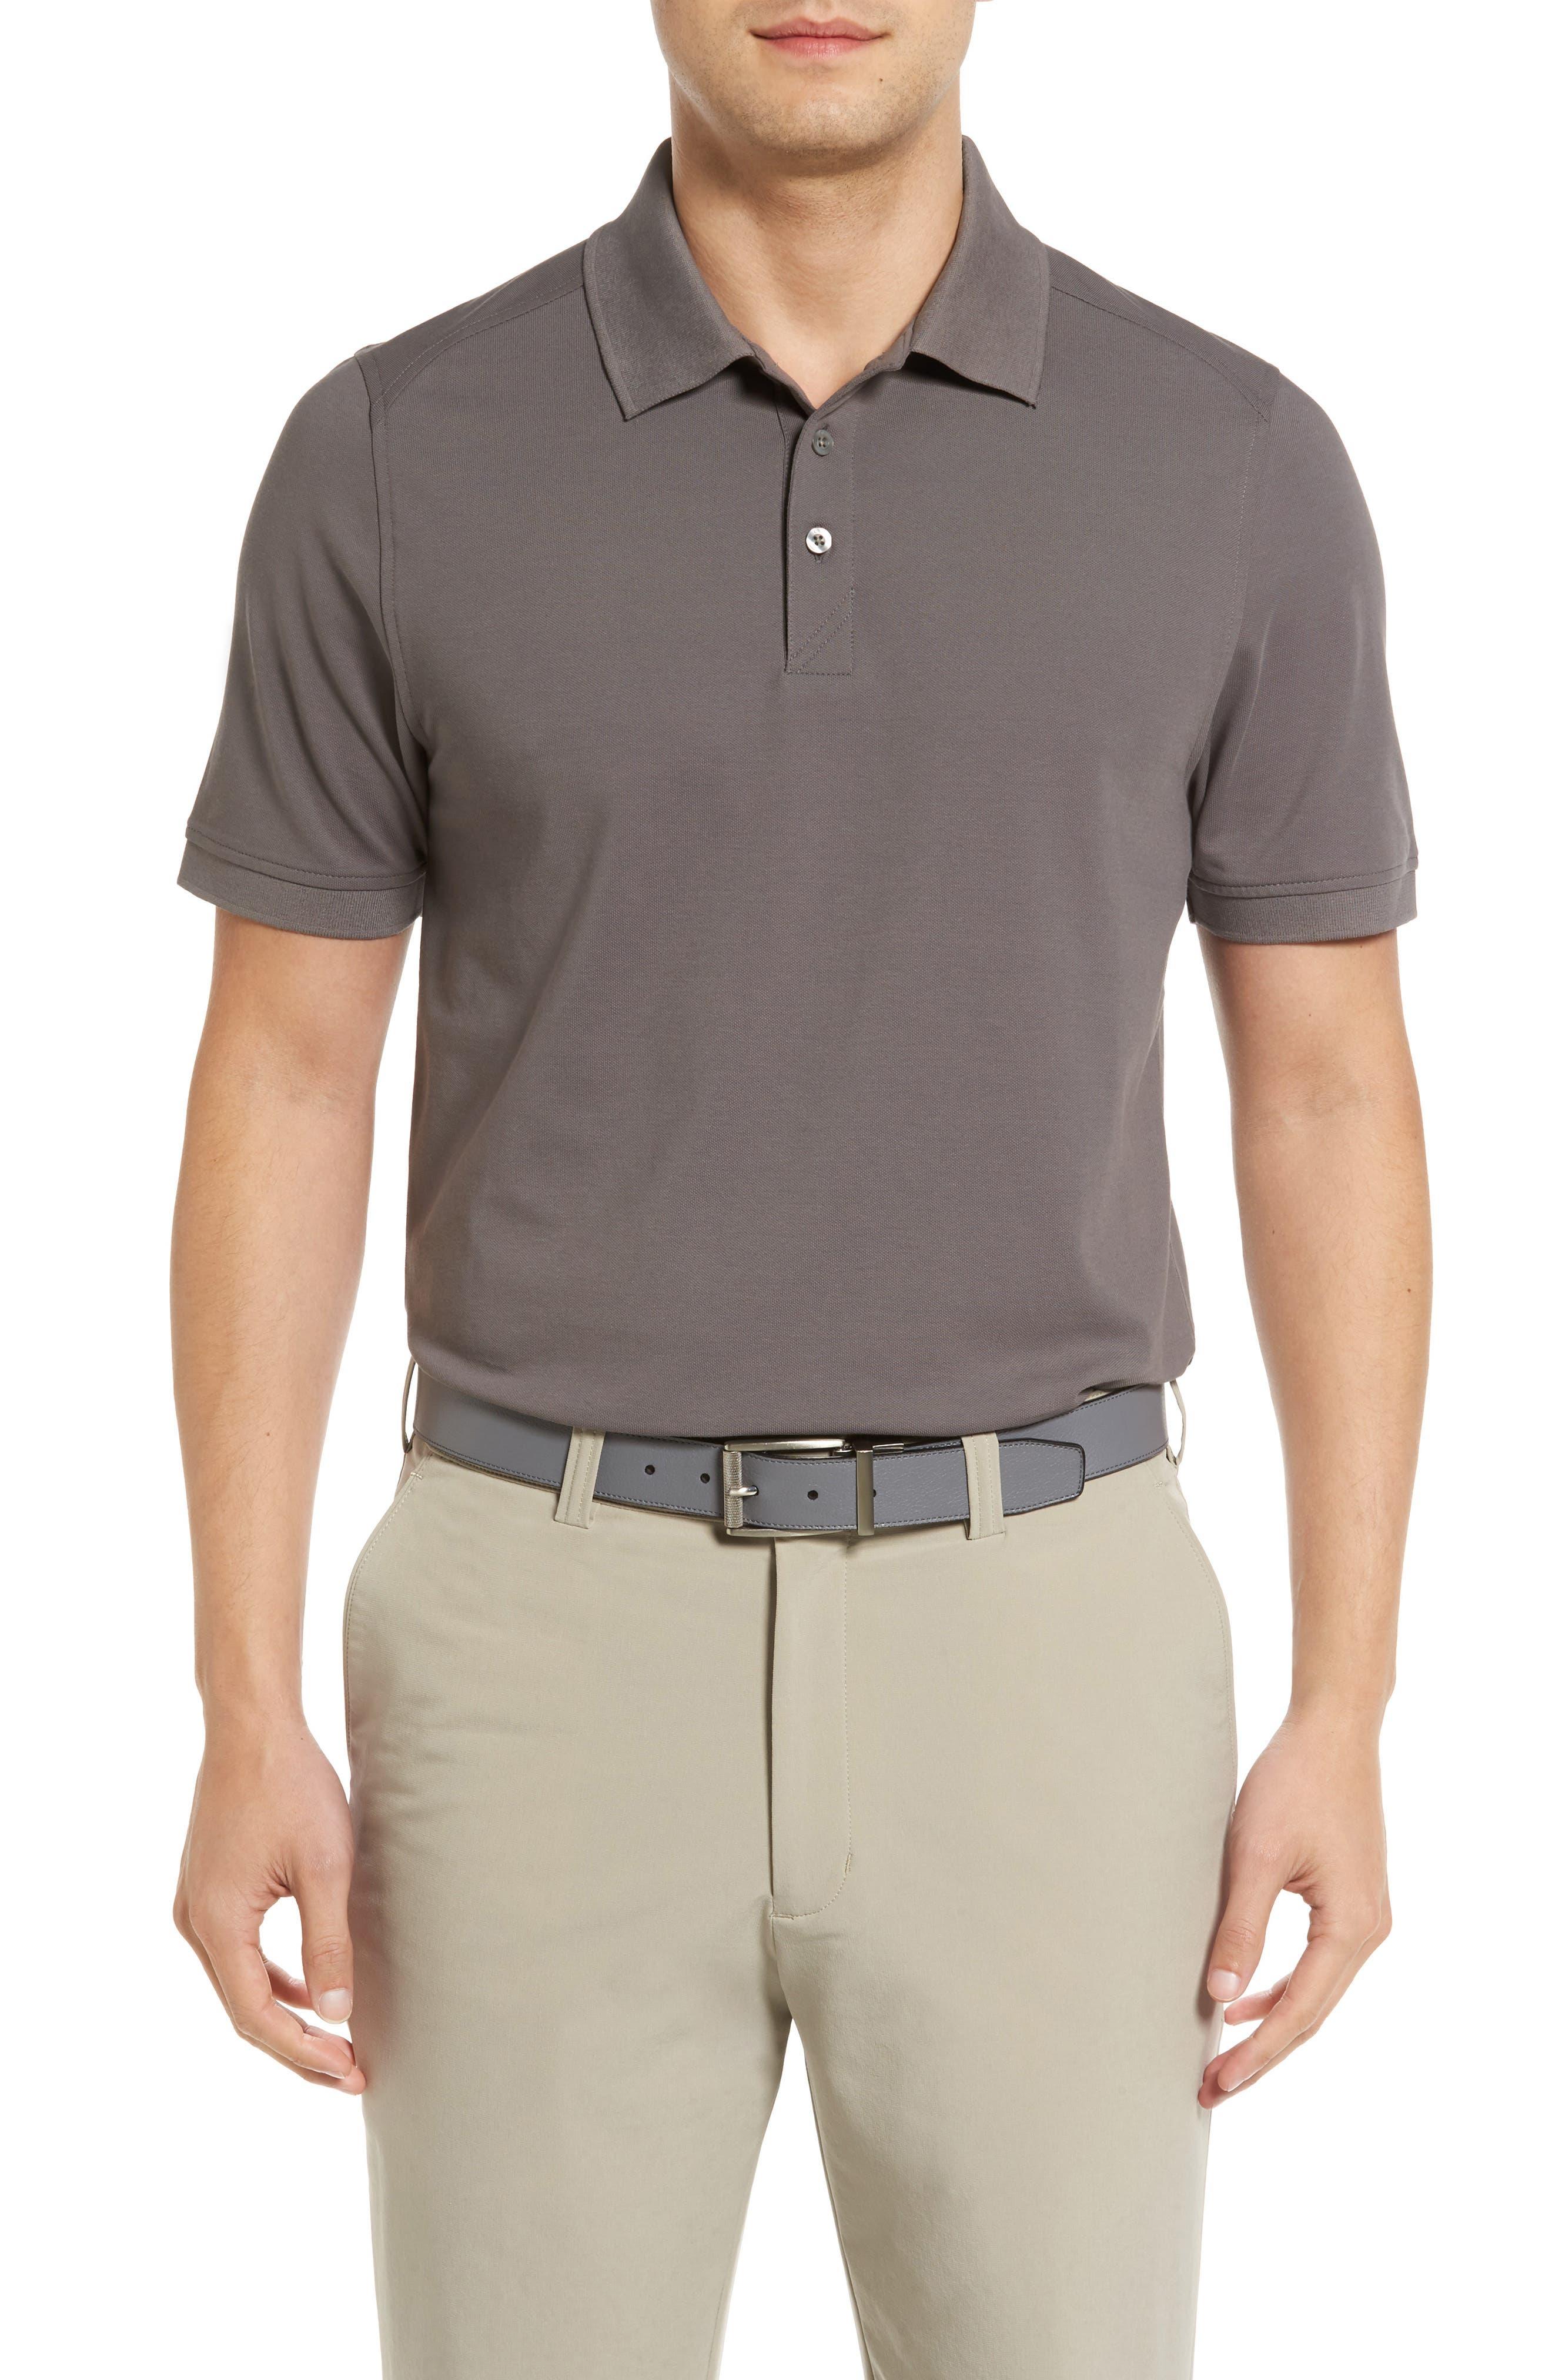 CUTTER & BUCK, Advantage Golf Polo, Main thumbnail 1, color, ELEMENTAL